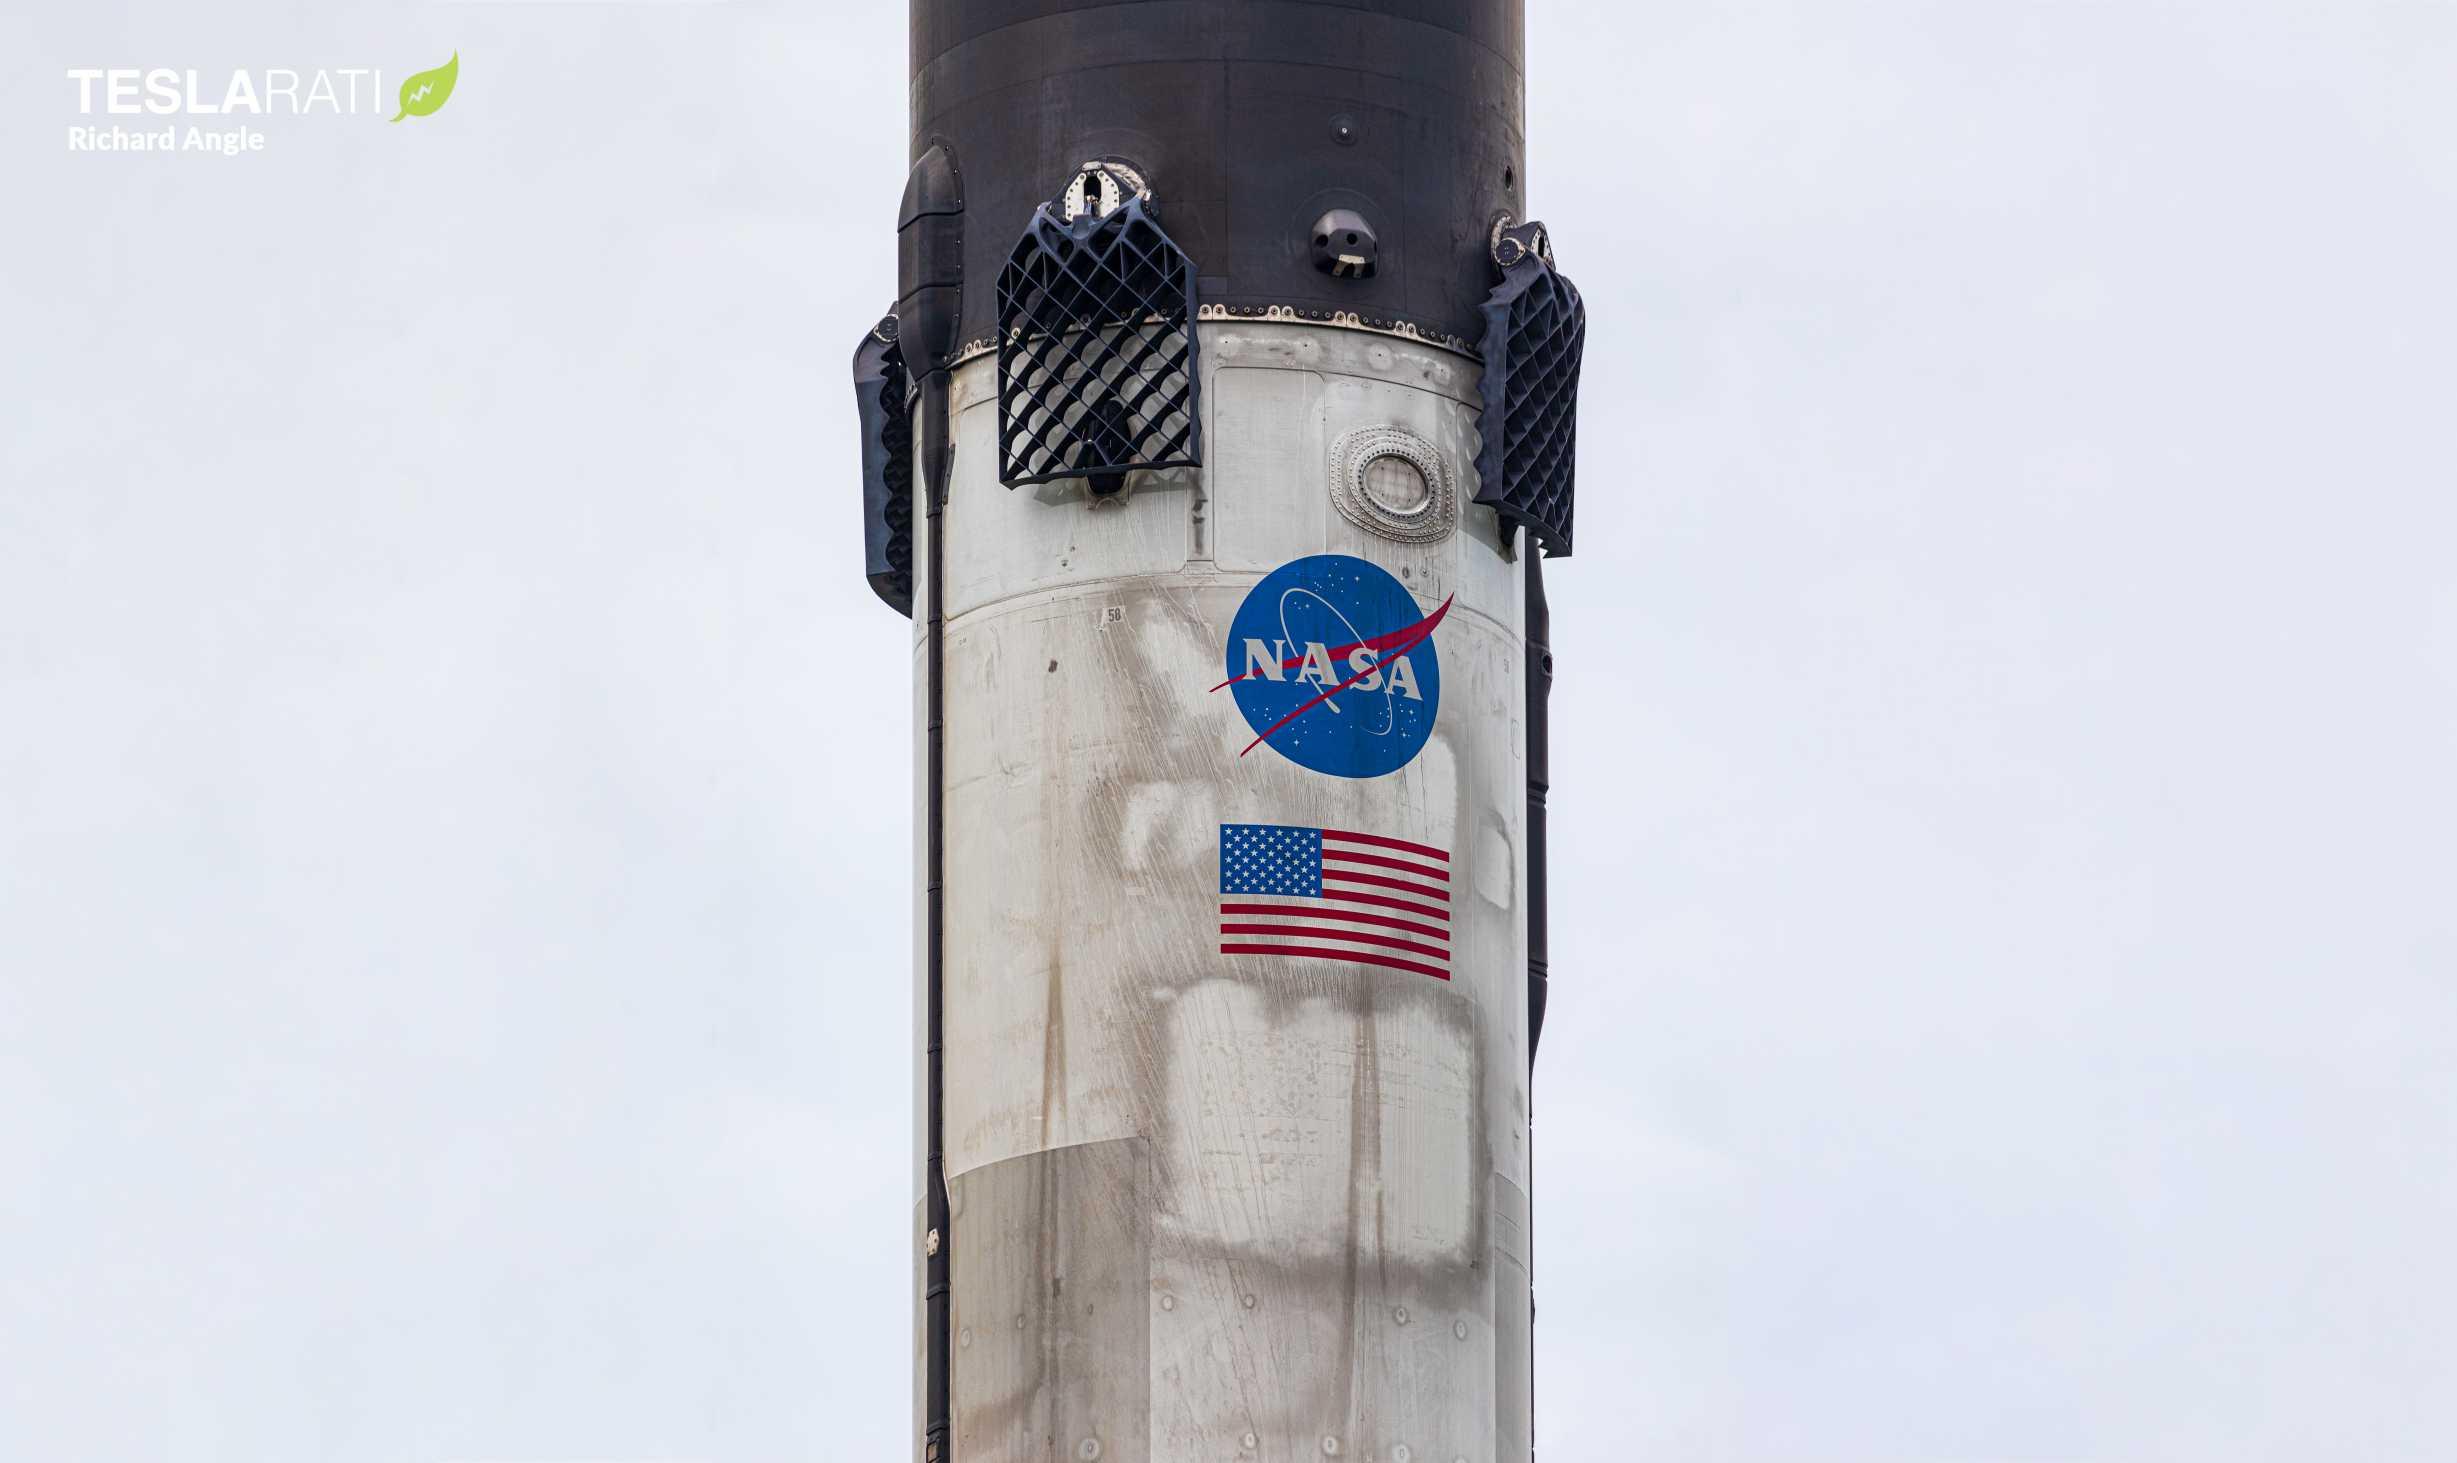 Crew Dragon Demo-2 Falcon 9 B1058 OCISLY return 060220 (Richard Angle) (10) edit (c)